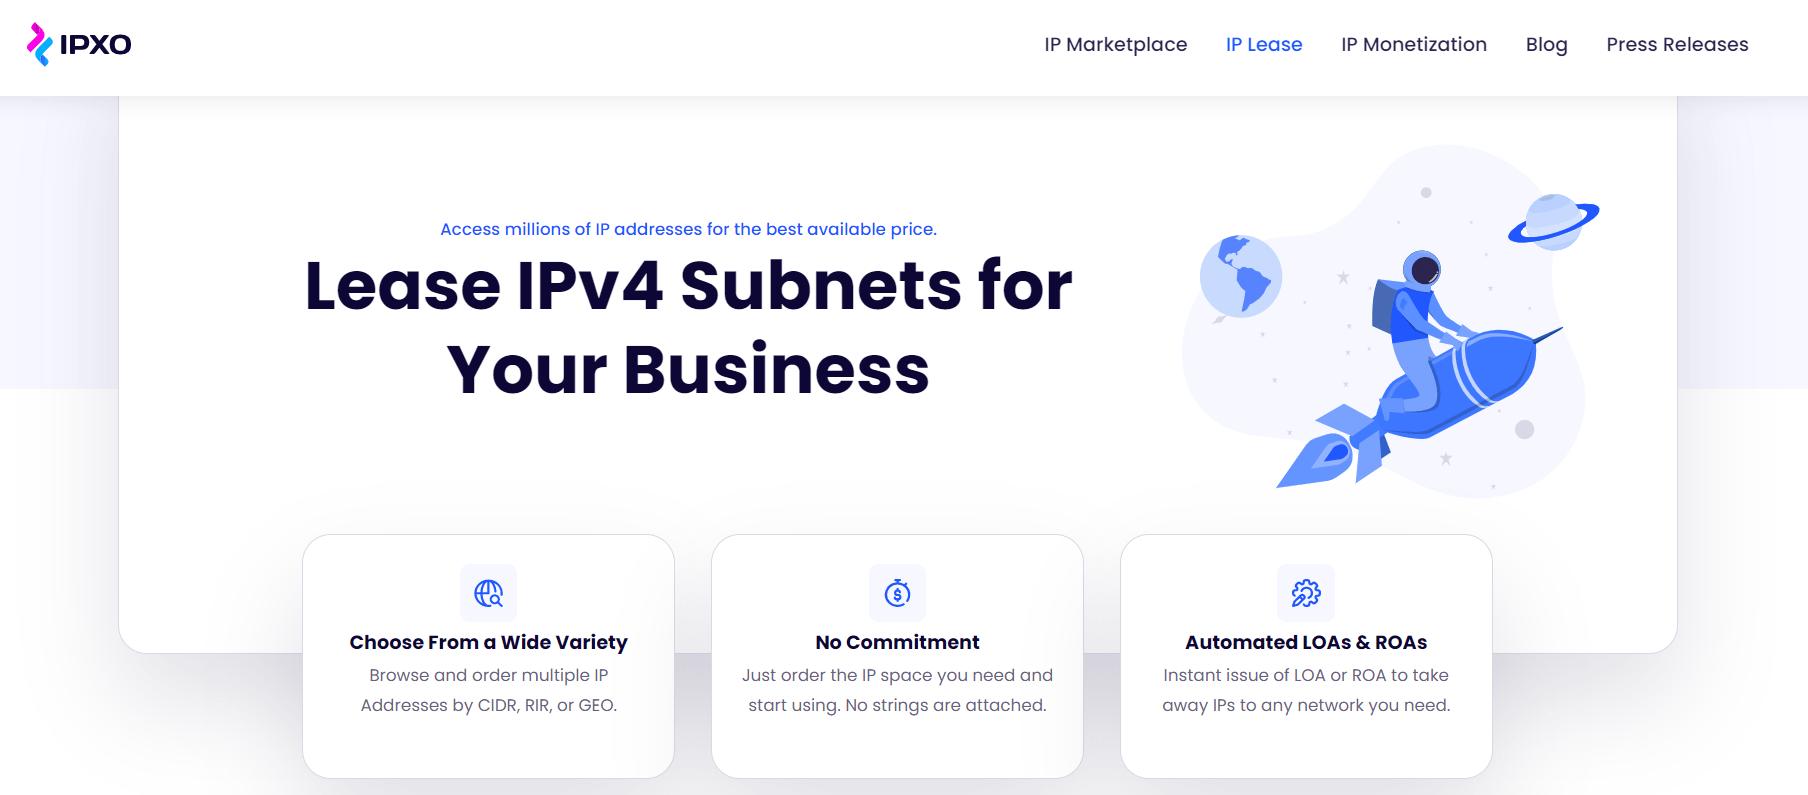 ipxo ip lease- ipxo review